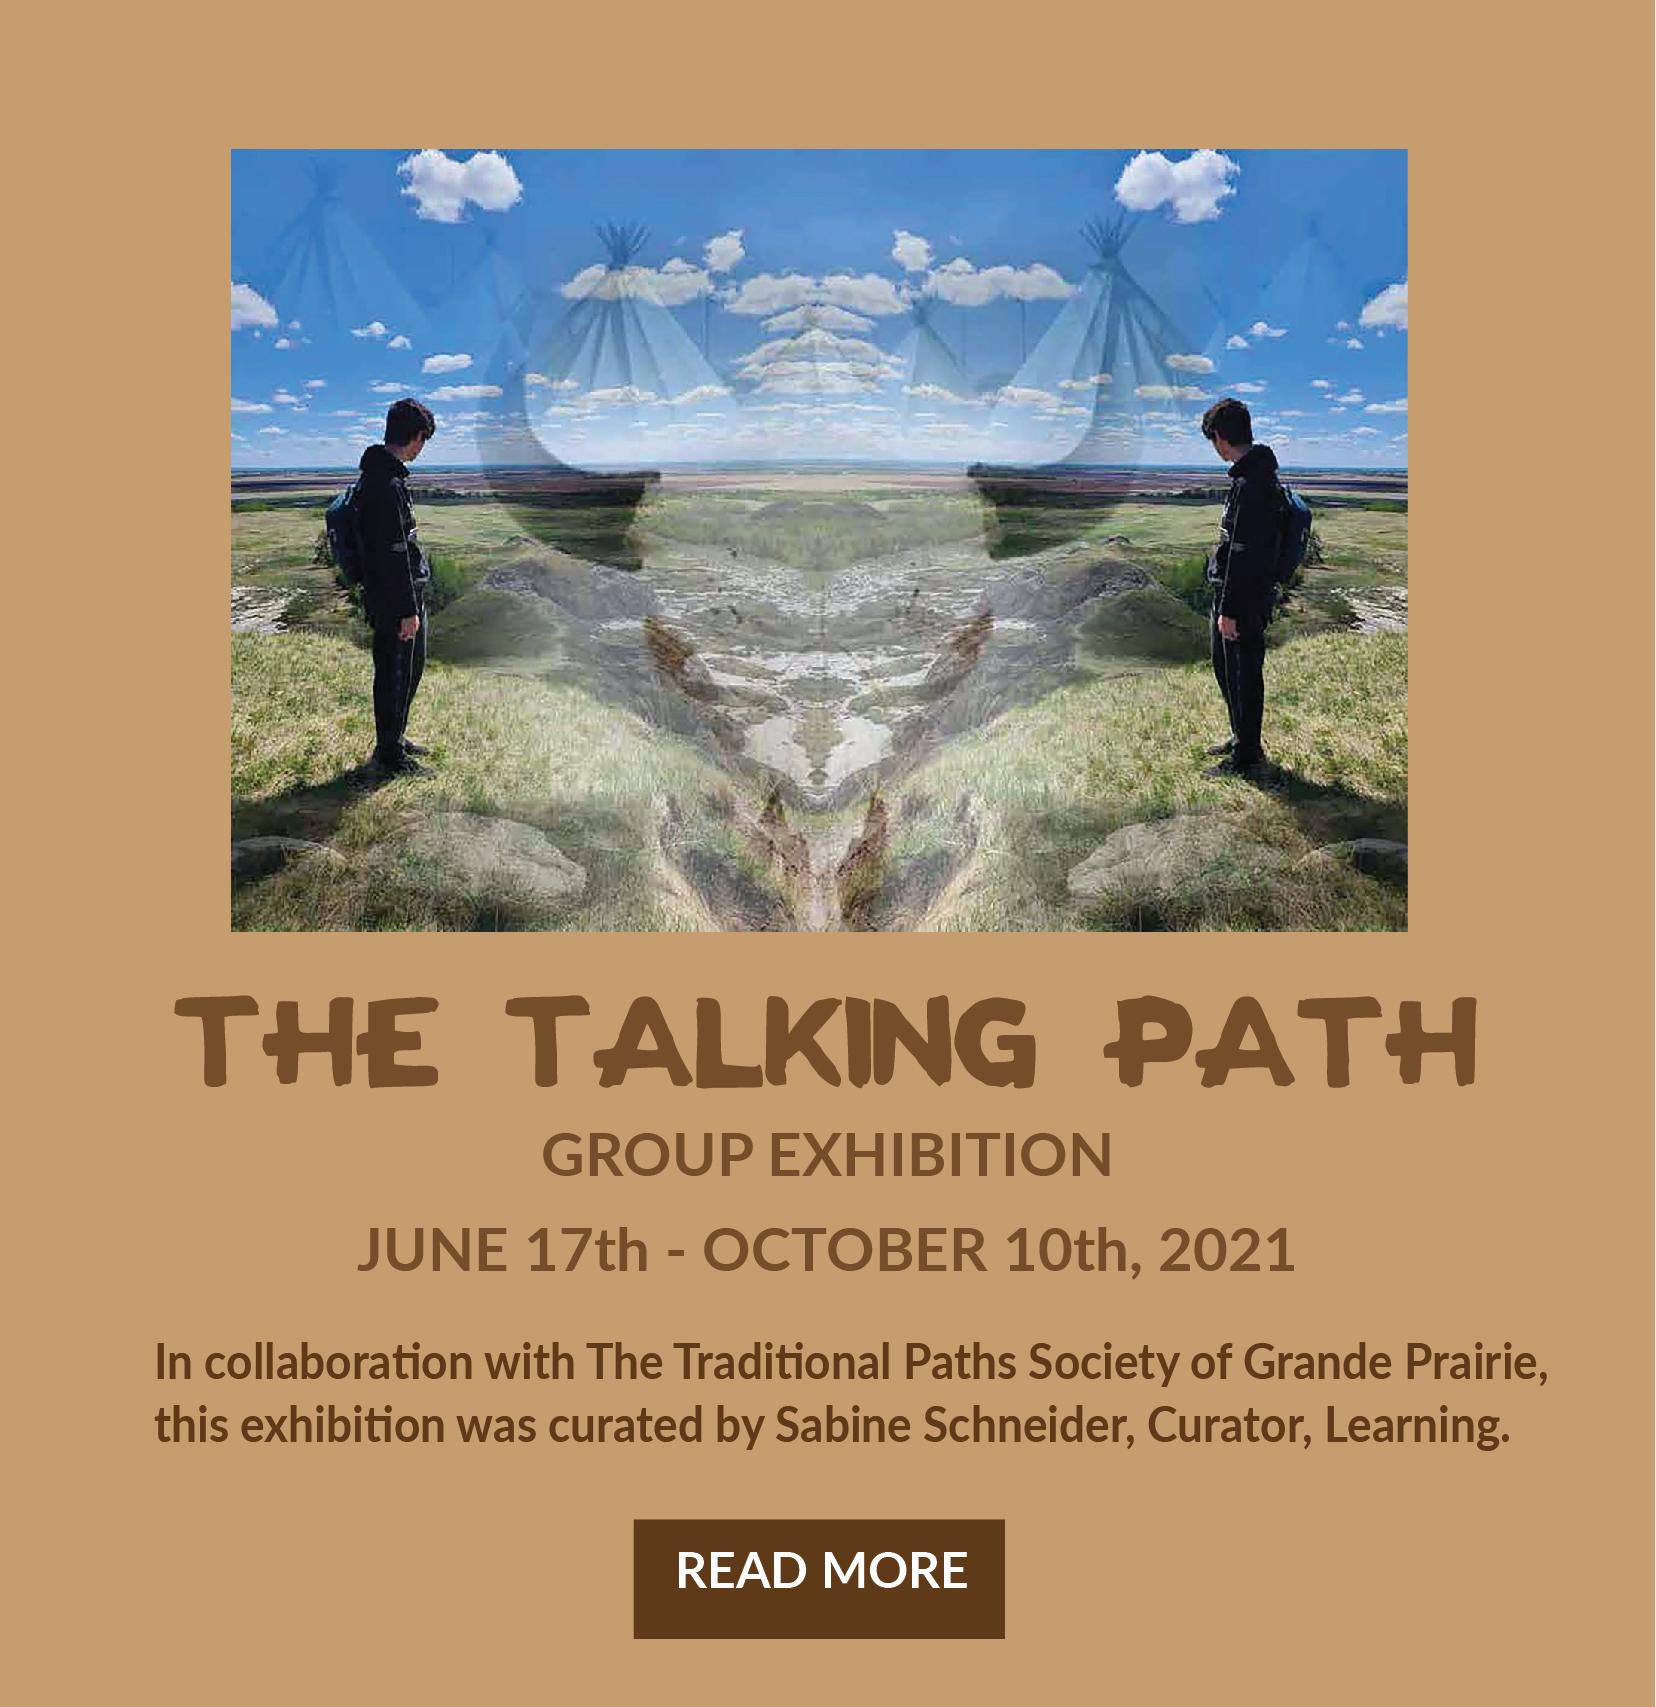 The Talking Path